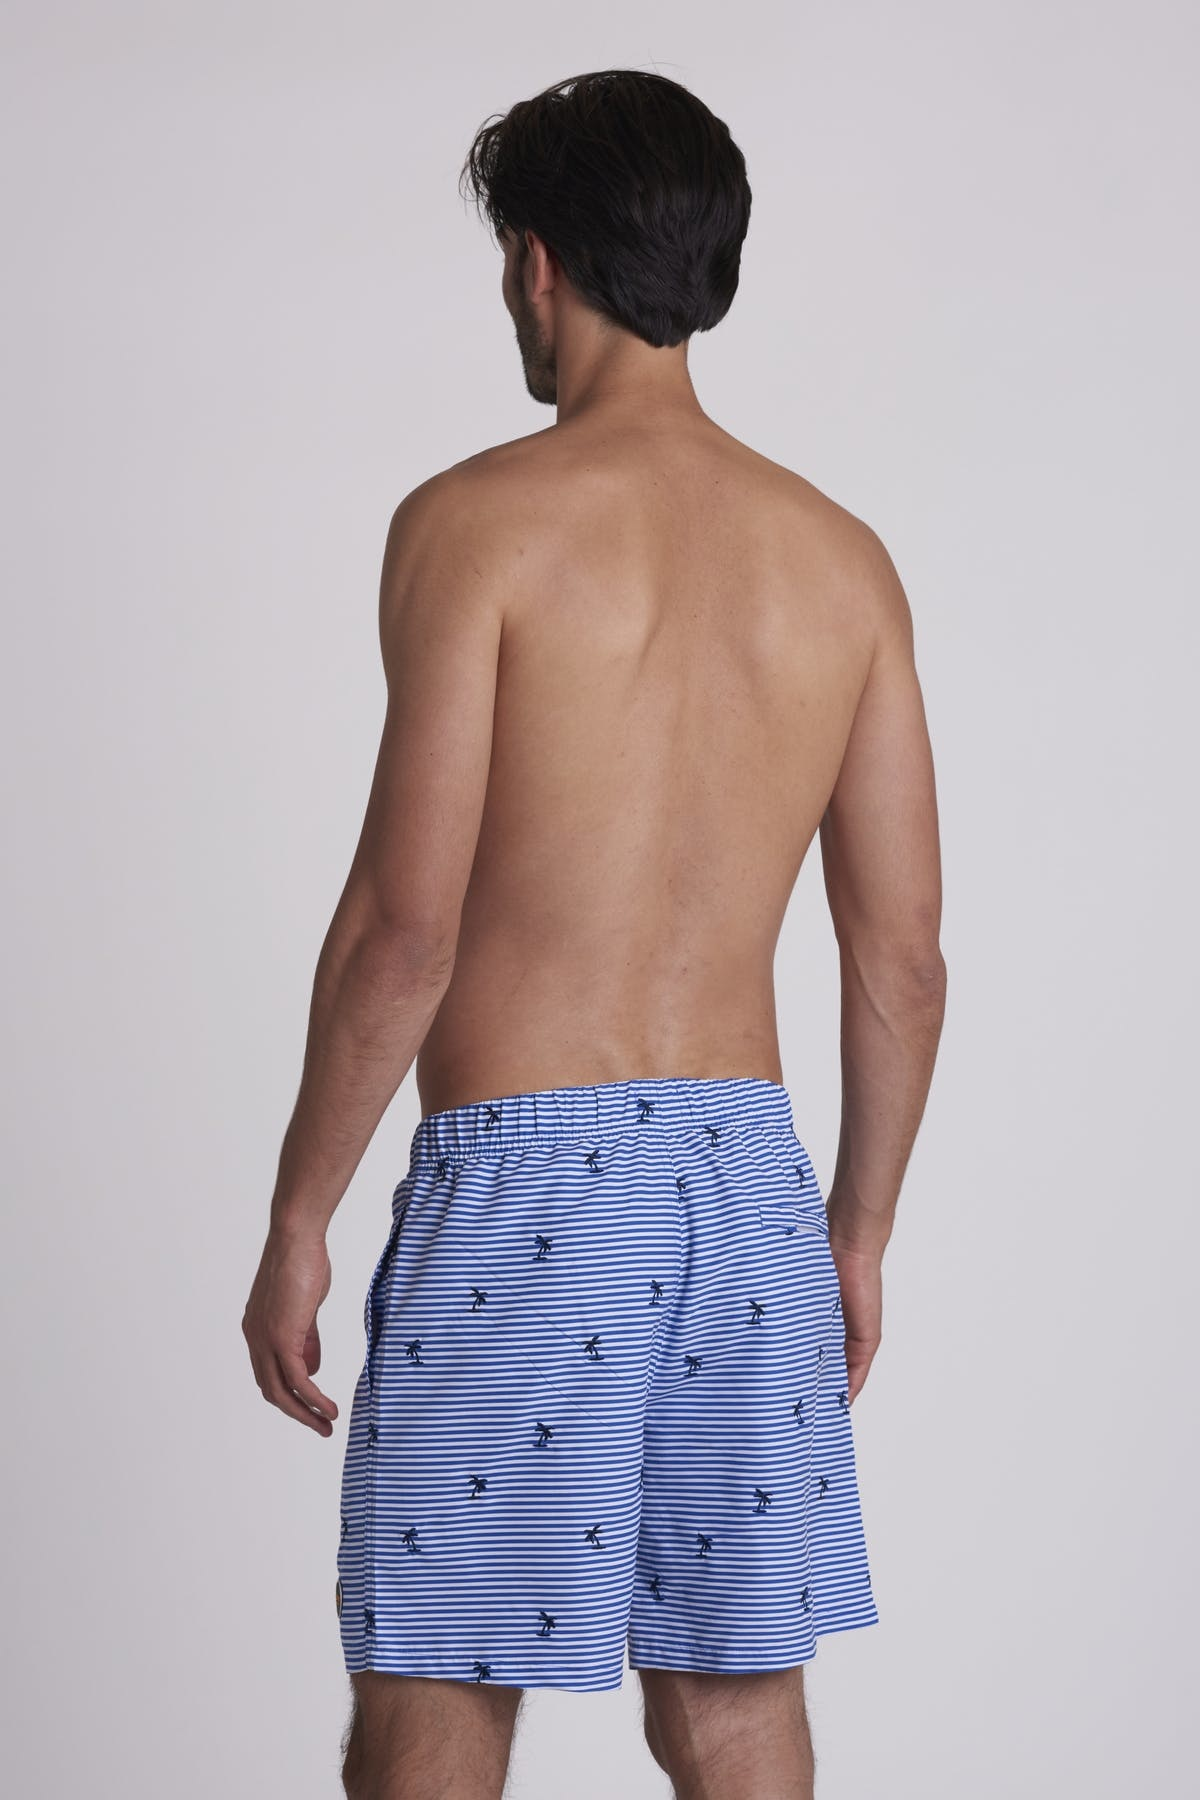 SHIWI Shiwi Striped Palm Swimshort Bali Blue